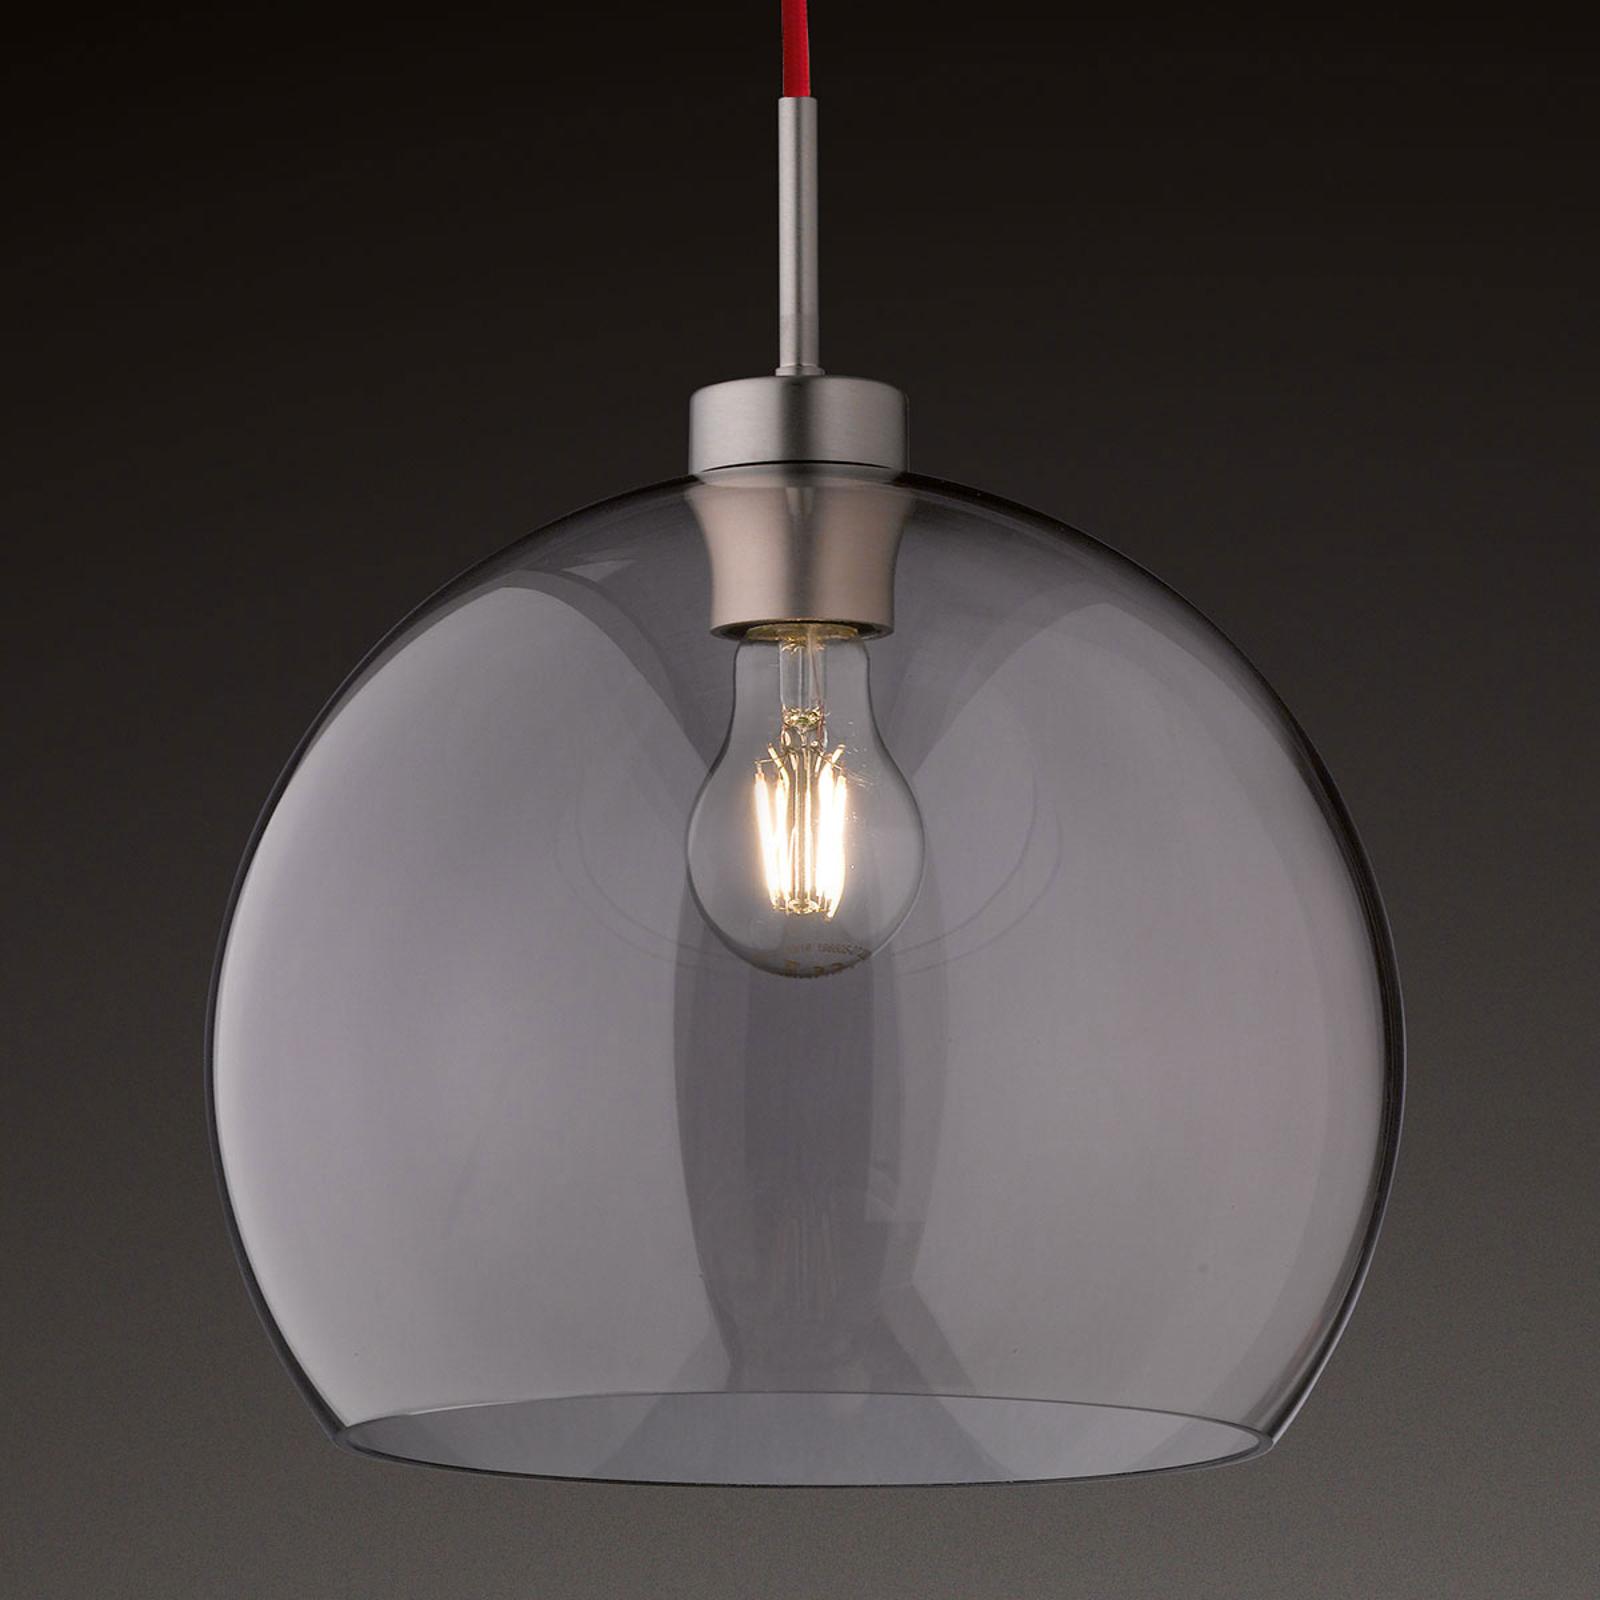 Glas-hanglamp Clear, 30 cm